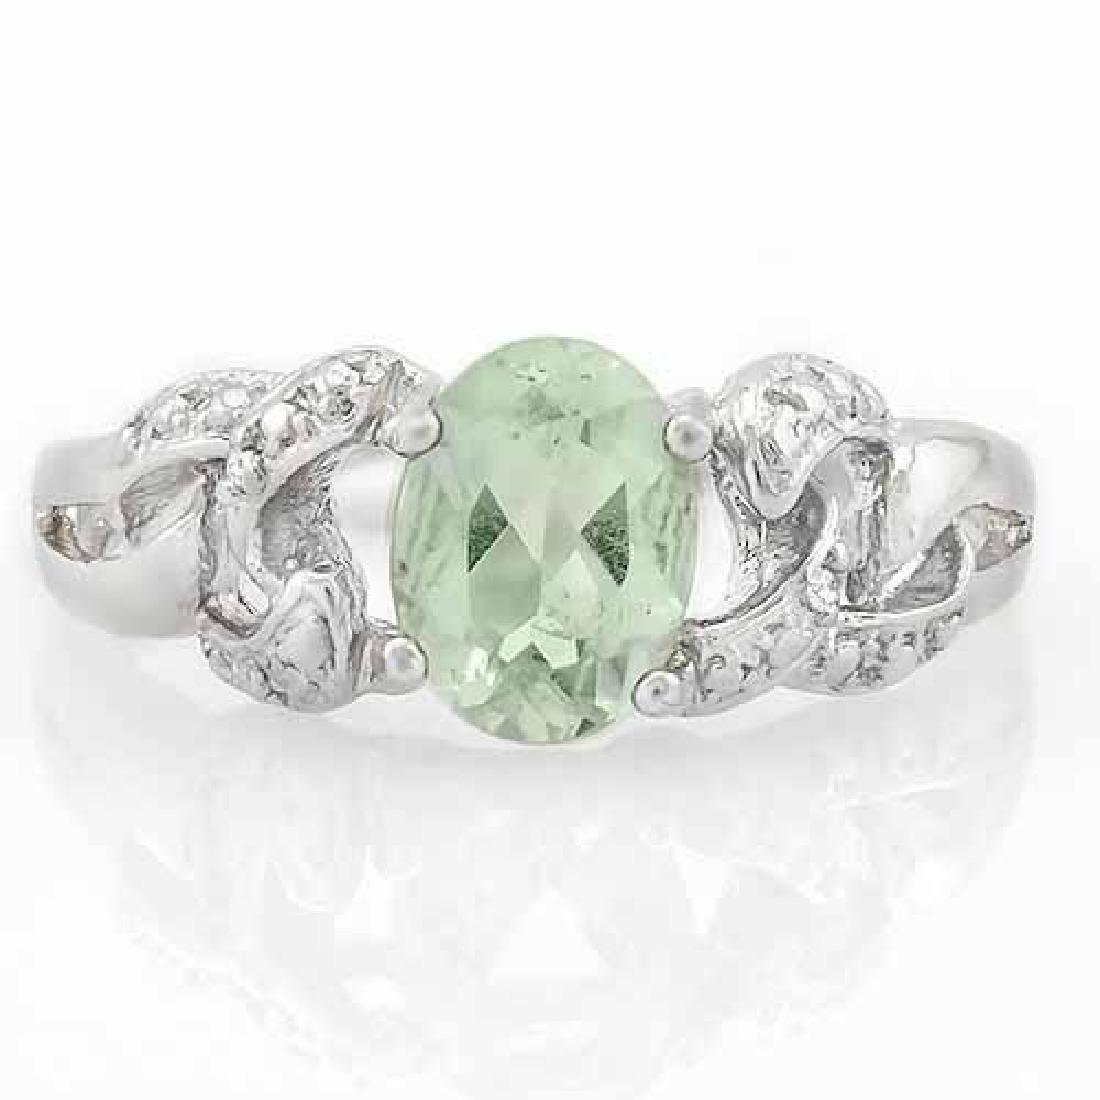 1 CARAT GREEN AMETHYST & DIAMOND 925 STERLING SILVER RI